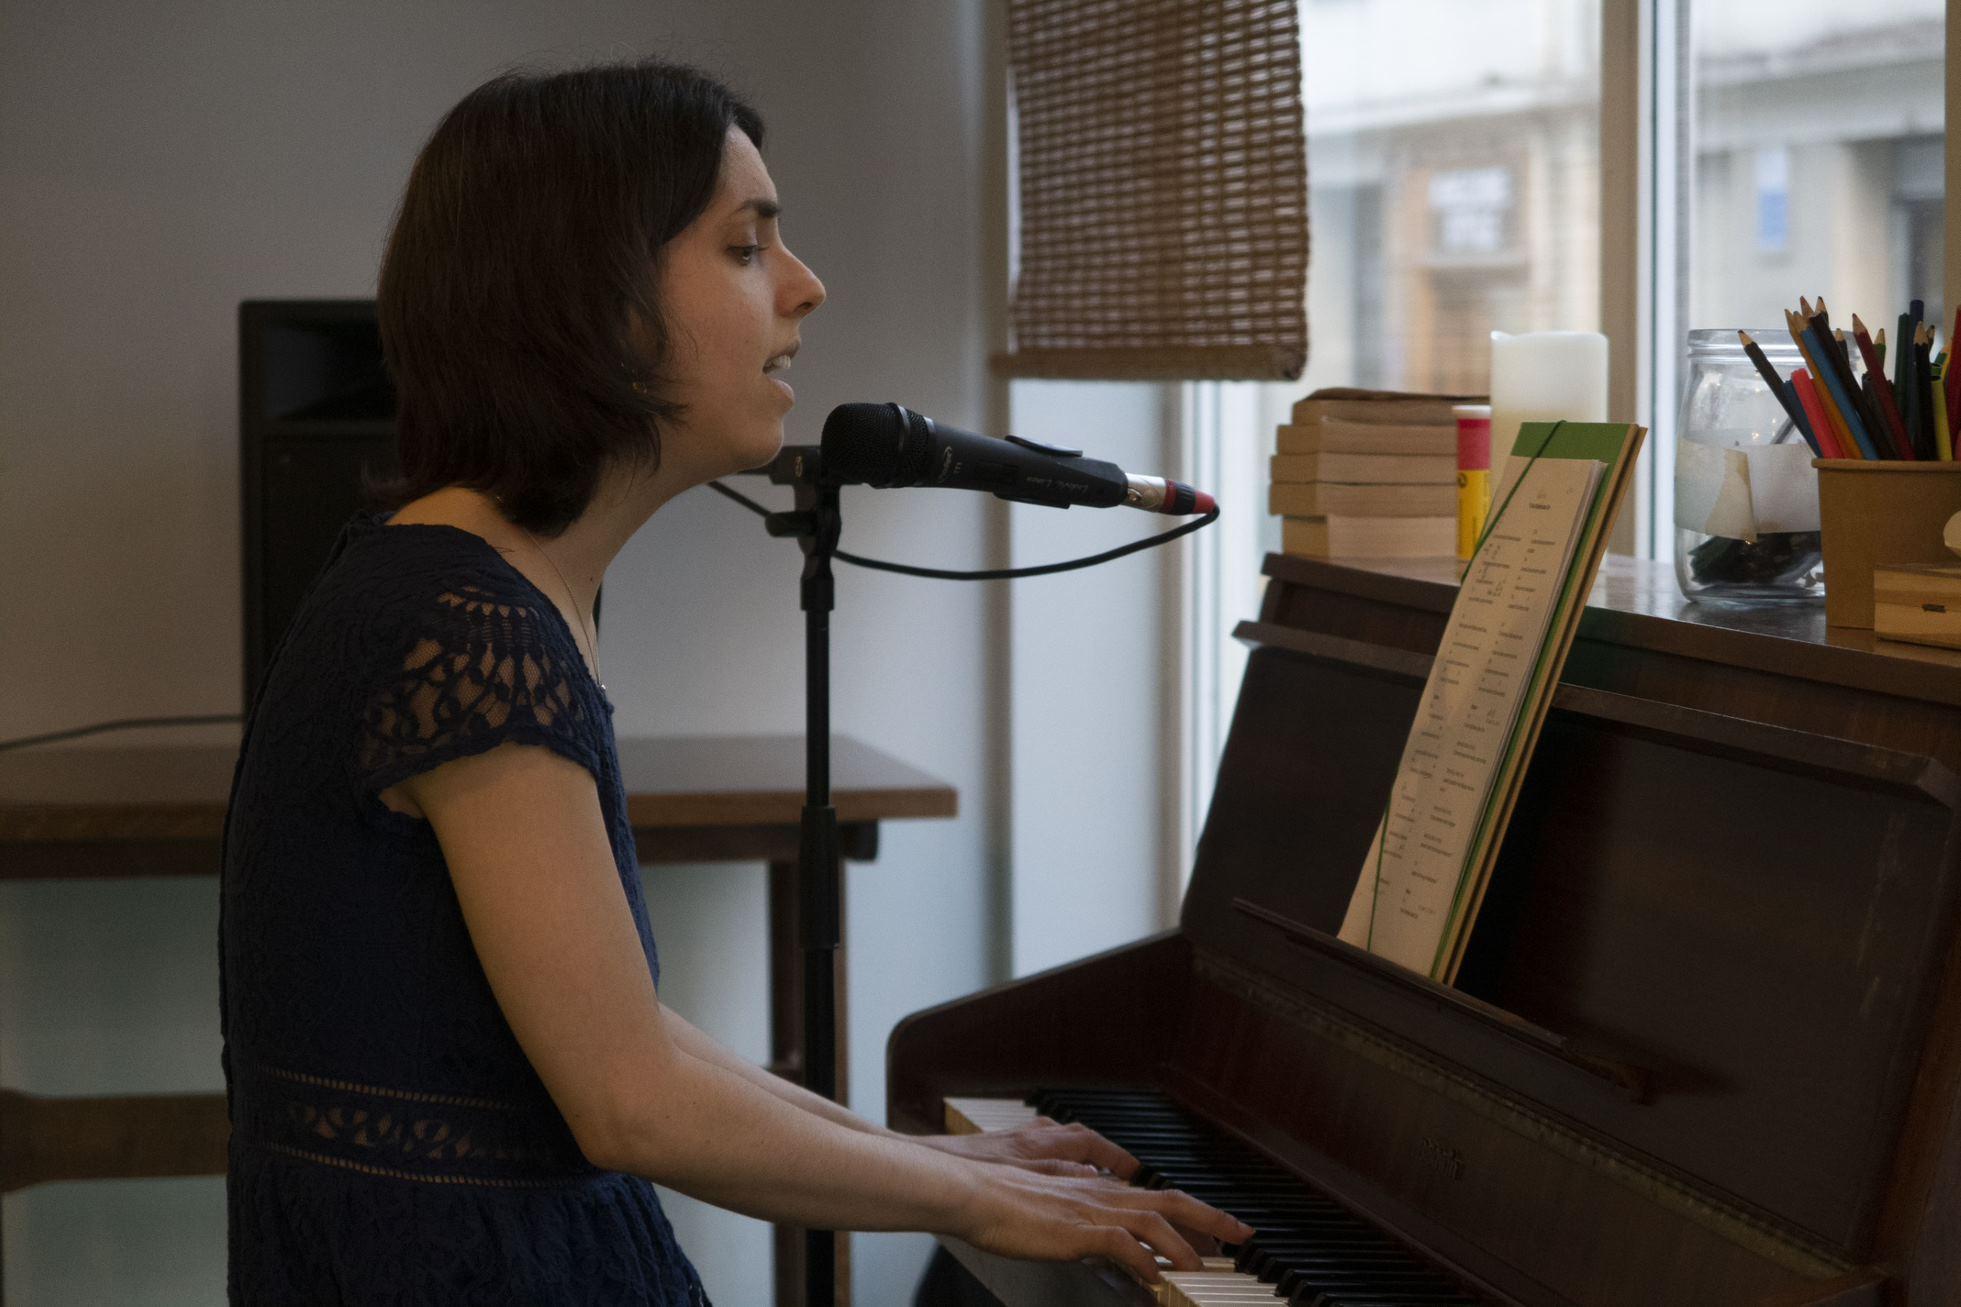 Céline Pagnac